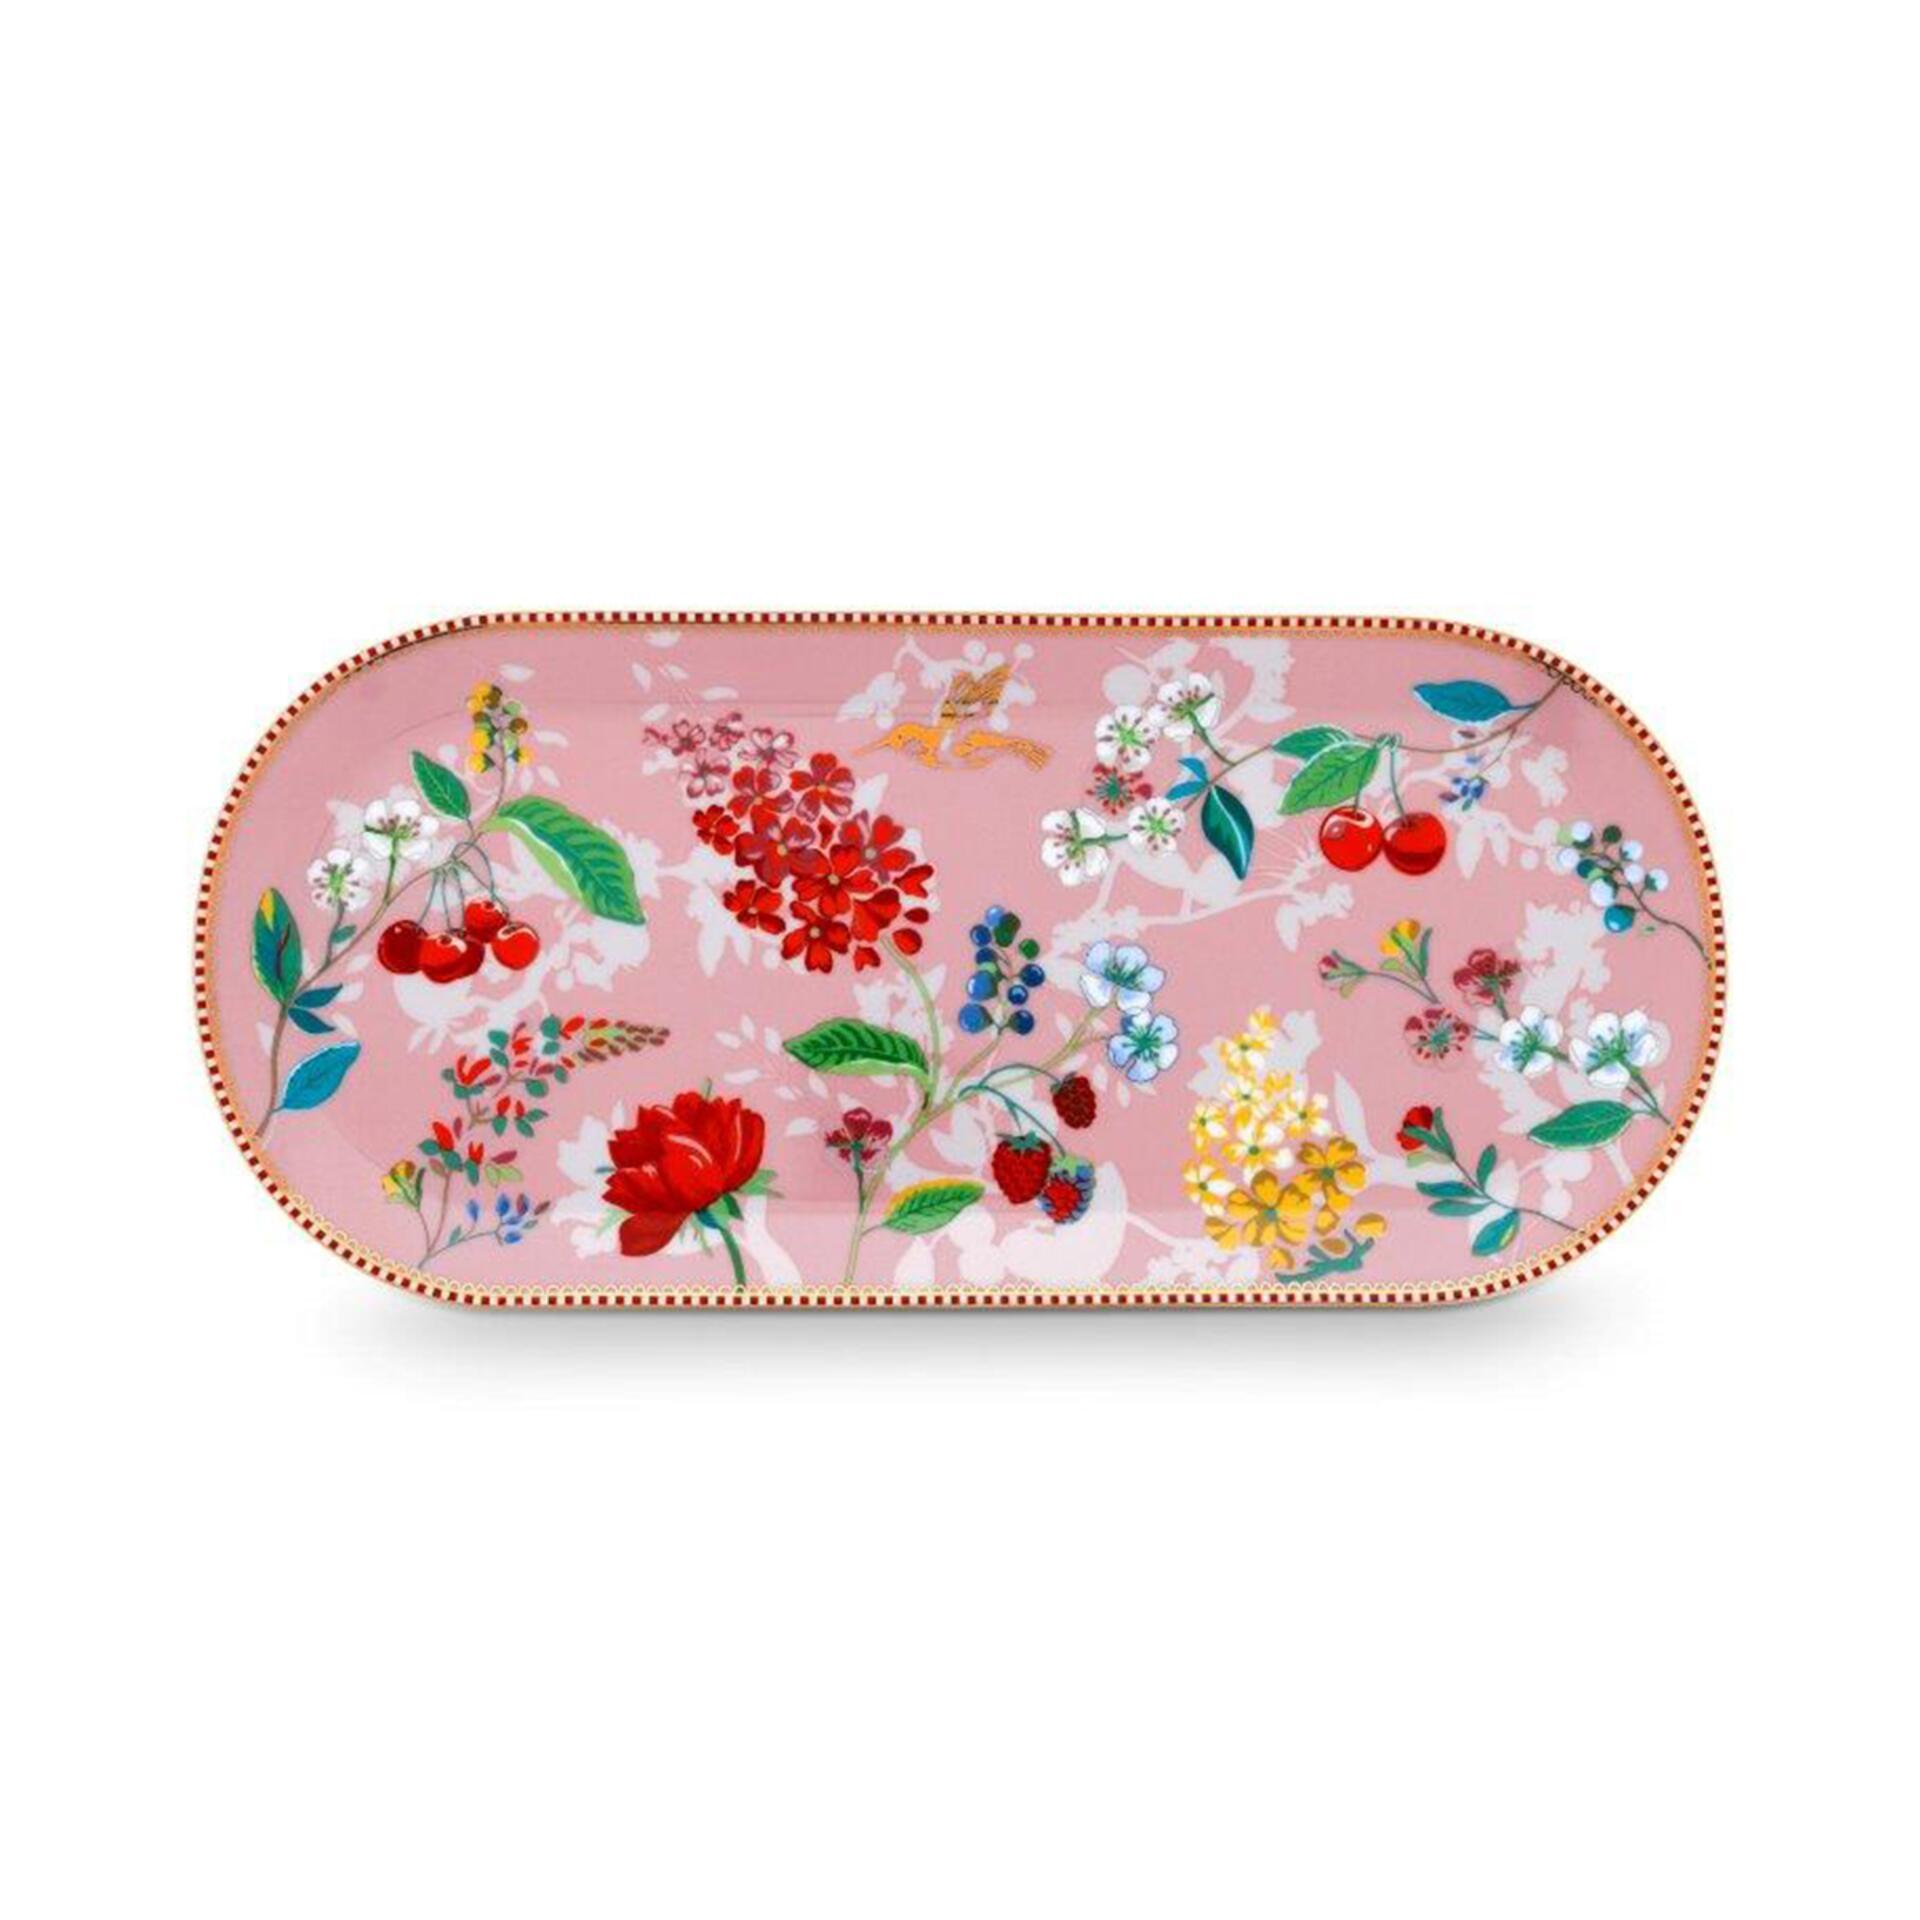 PiP Porzellan Kuchenplatte Hummingbirds Pink